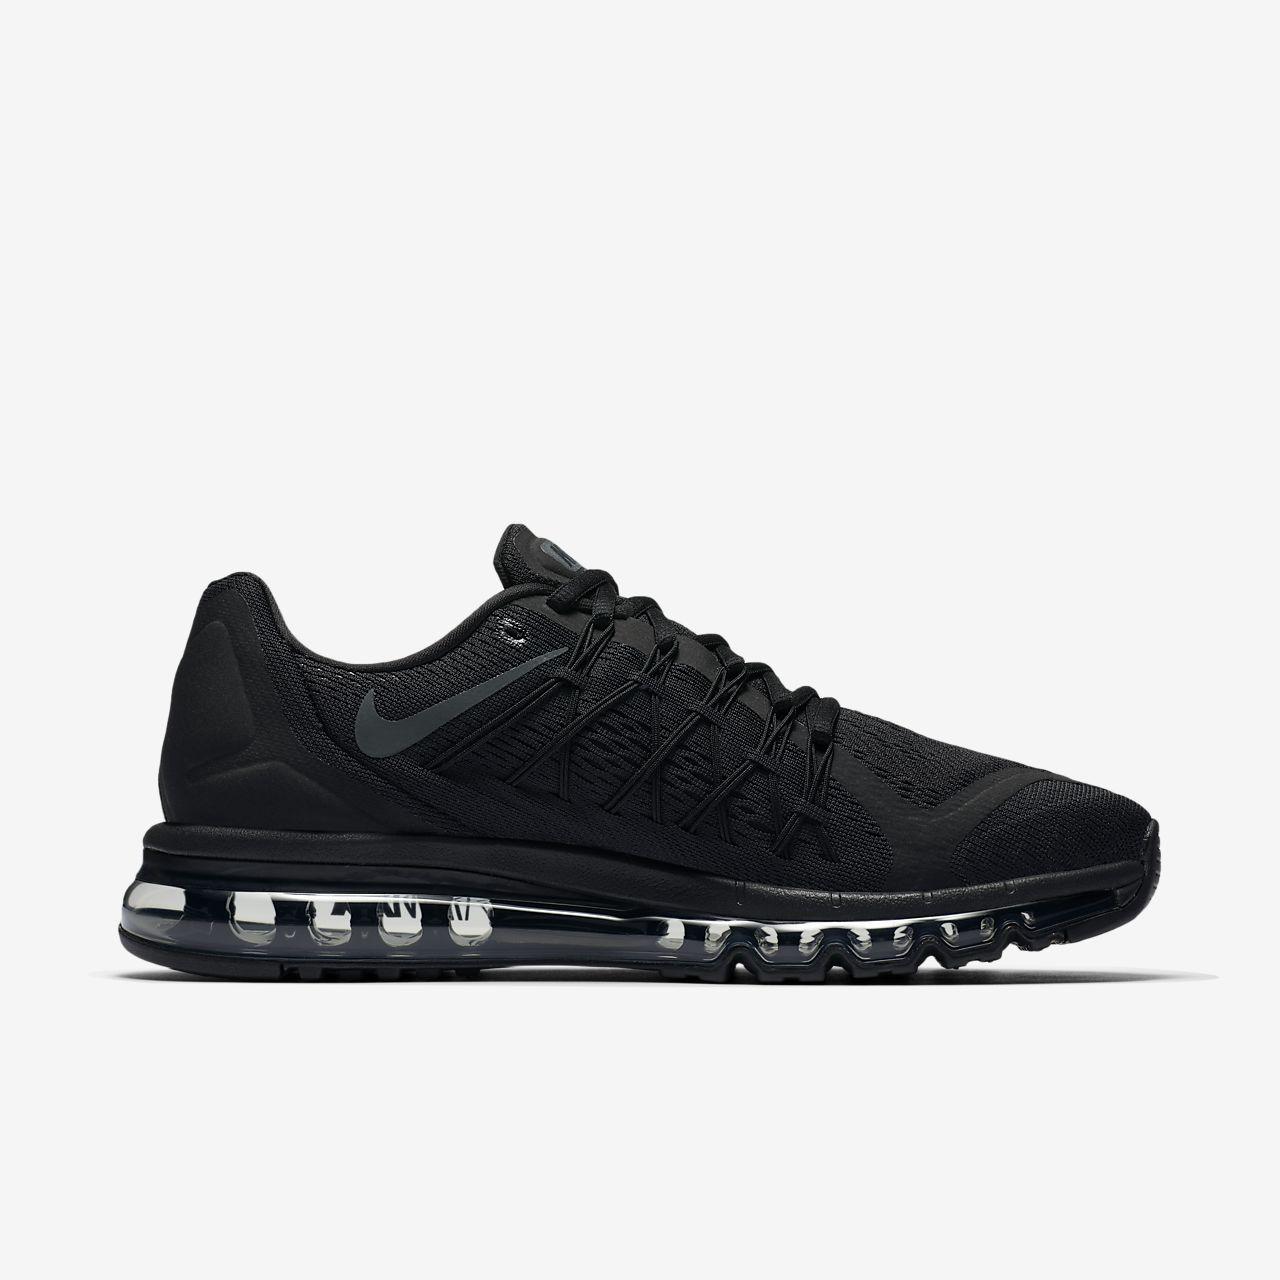 acheter populaire 0ab17 fdad7 Nike Air Max 2015 Men's Shoe